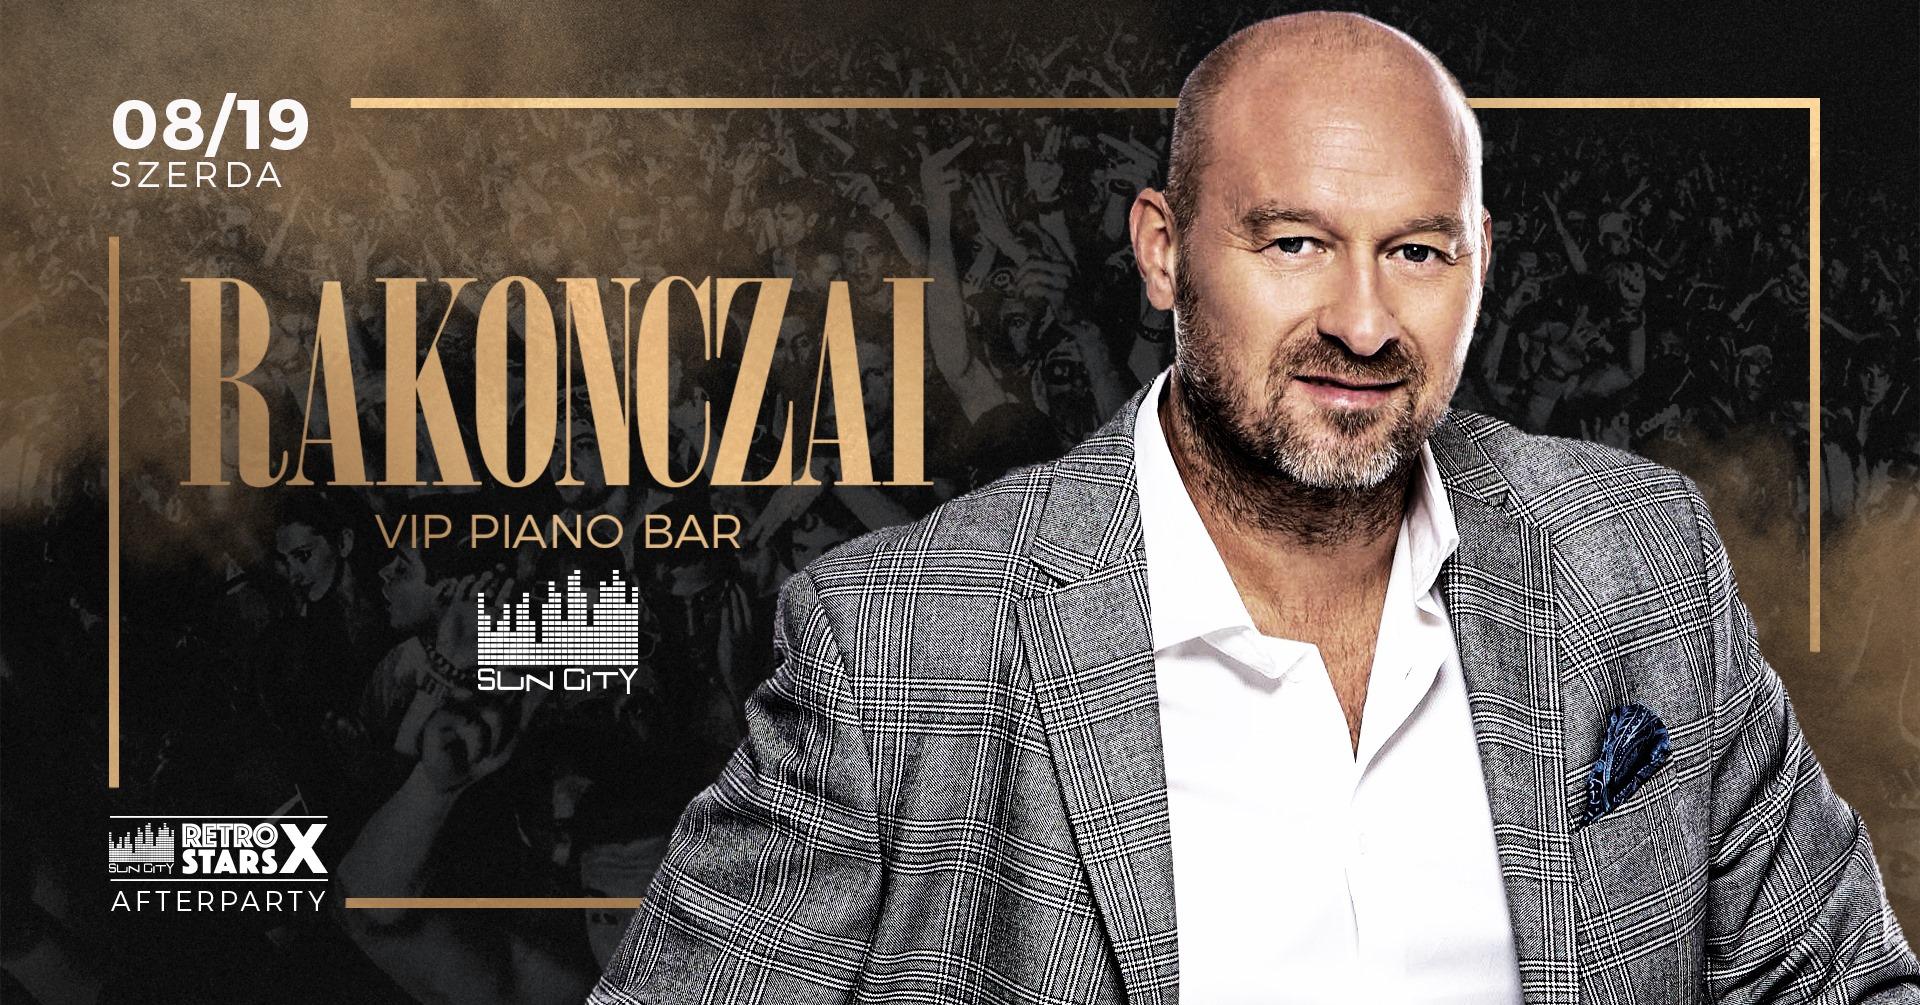 Rakonczai VIP Piano Bar • 08.19. • SunCity Balatonfüred